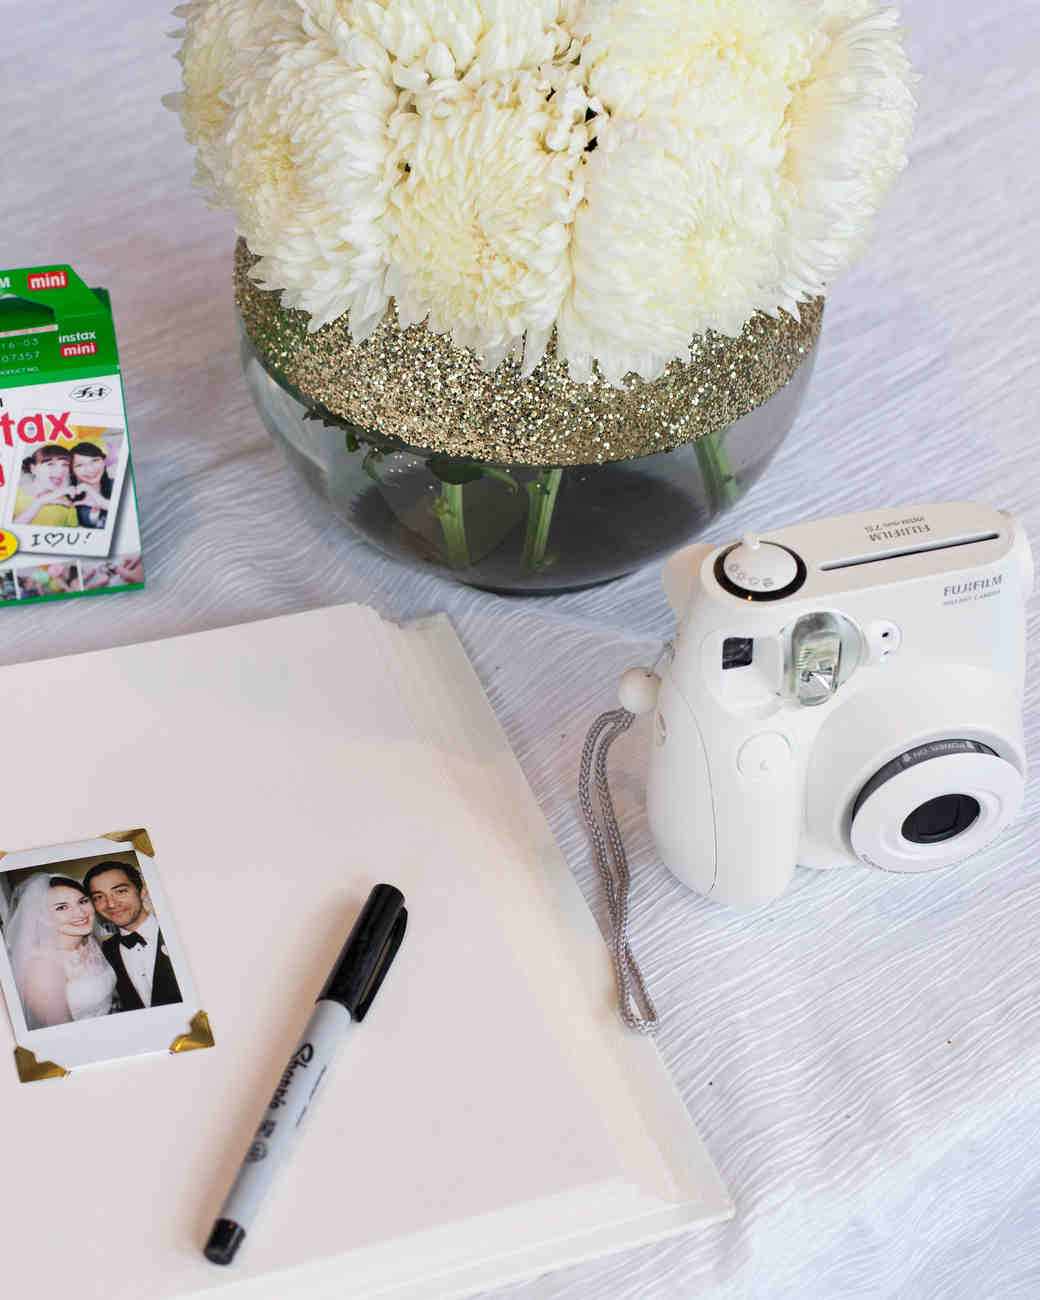 ashley-ryan-wedding-guestbook-3199-s111852-0415.jpg